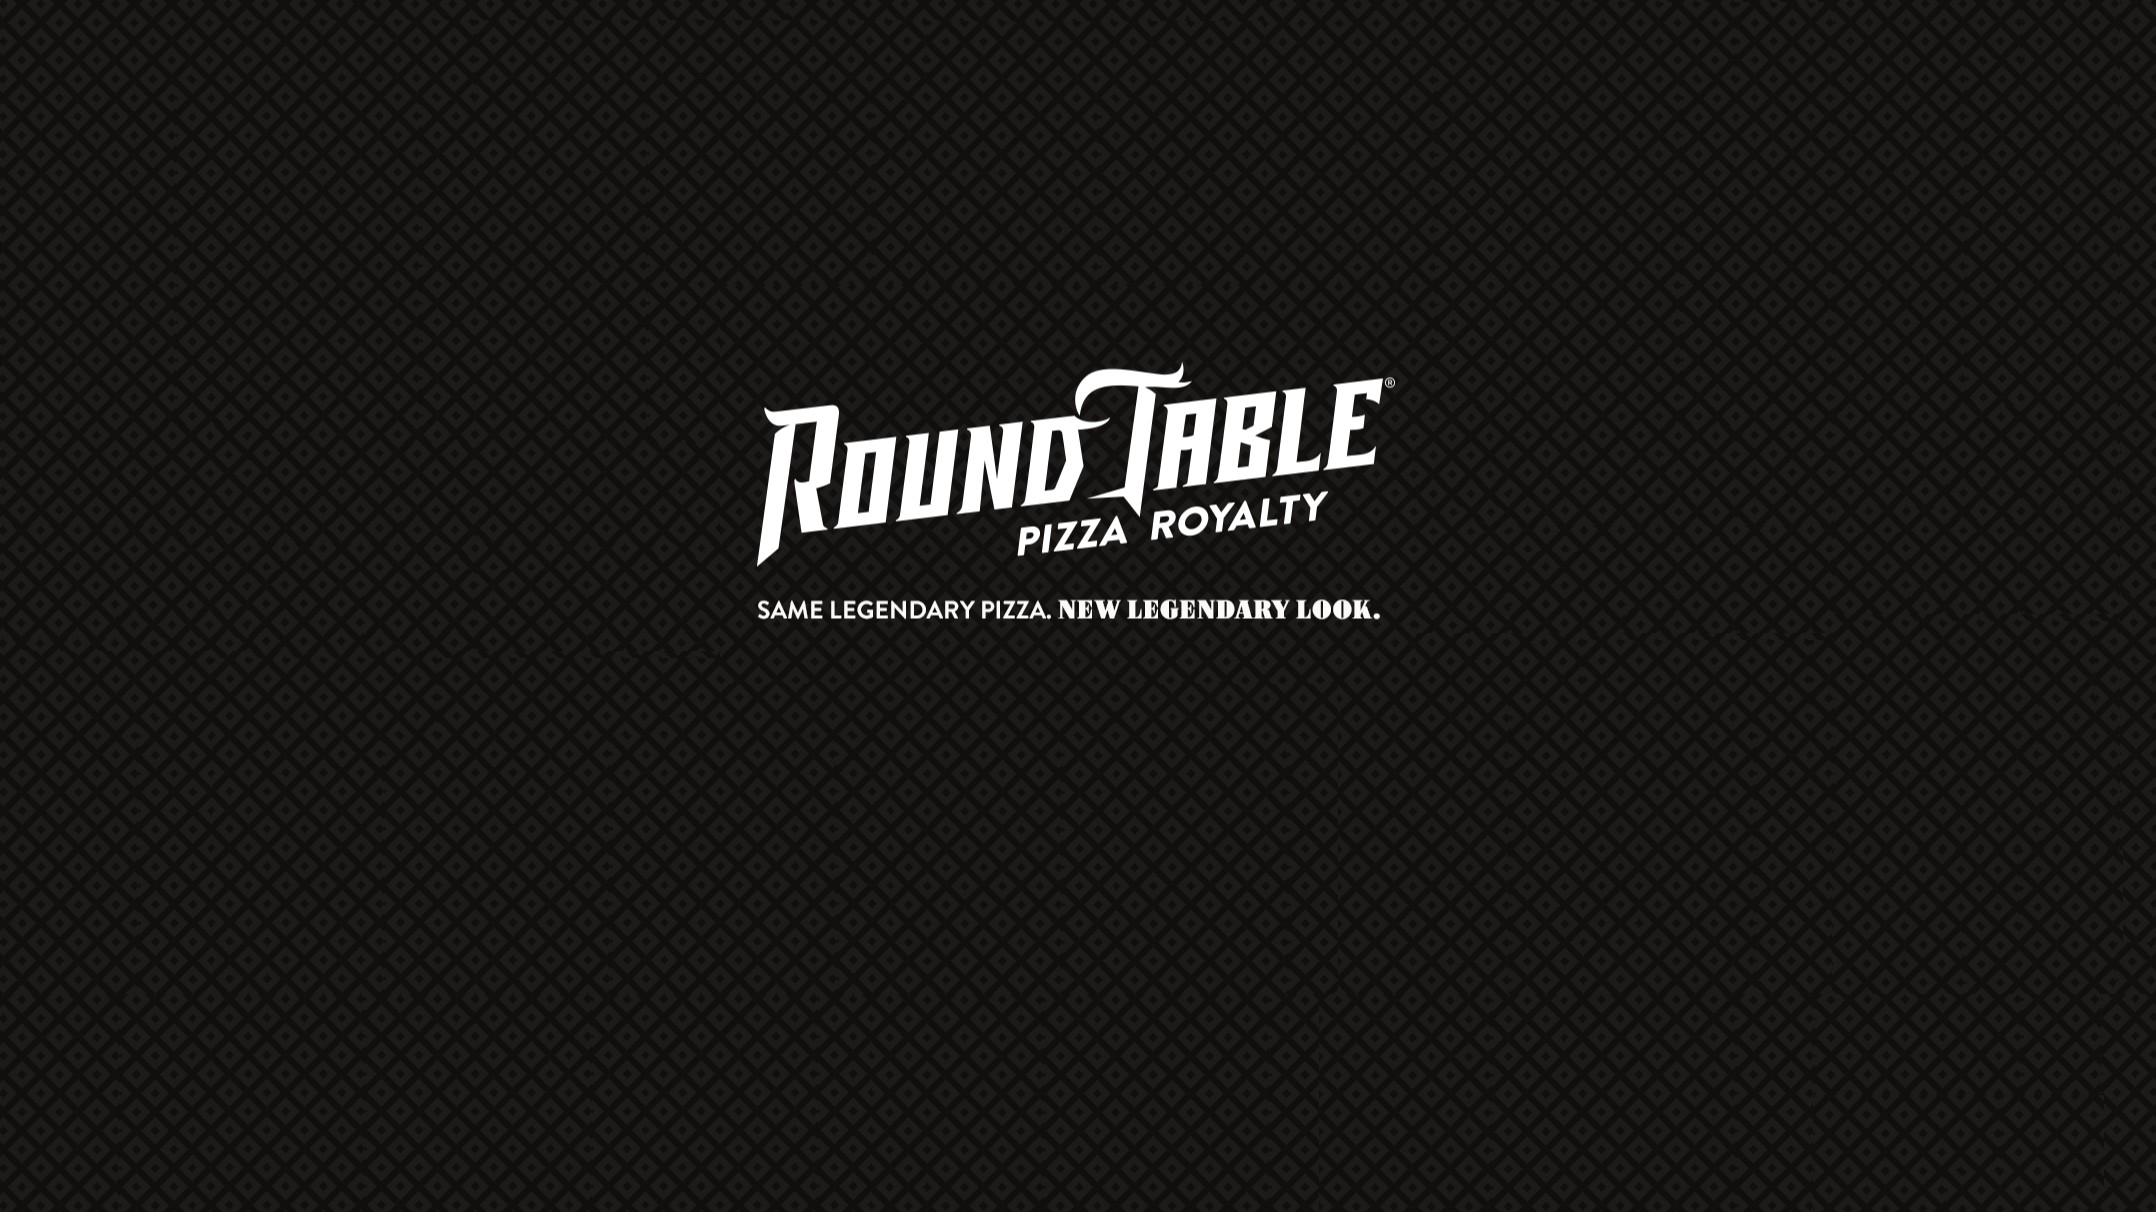 Round Table Pizza Concord.Round Table Pizza Linkedin